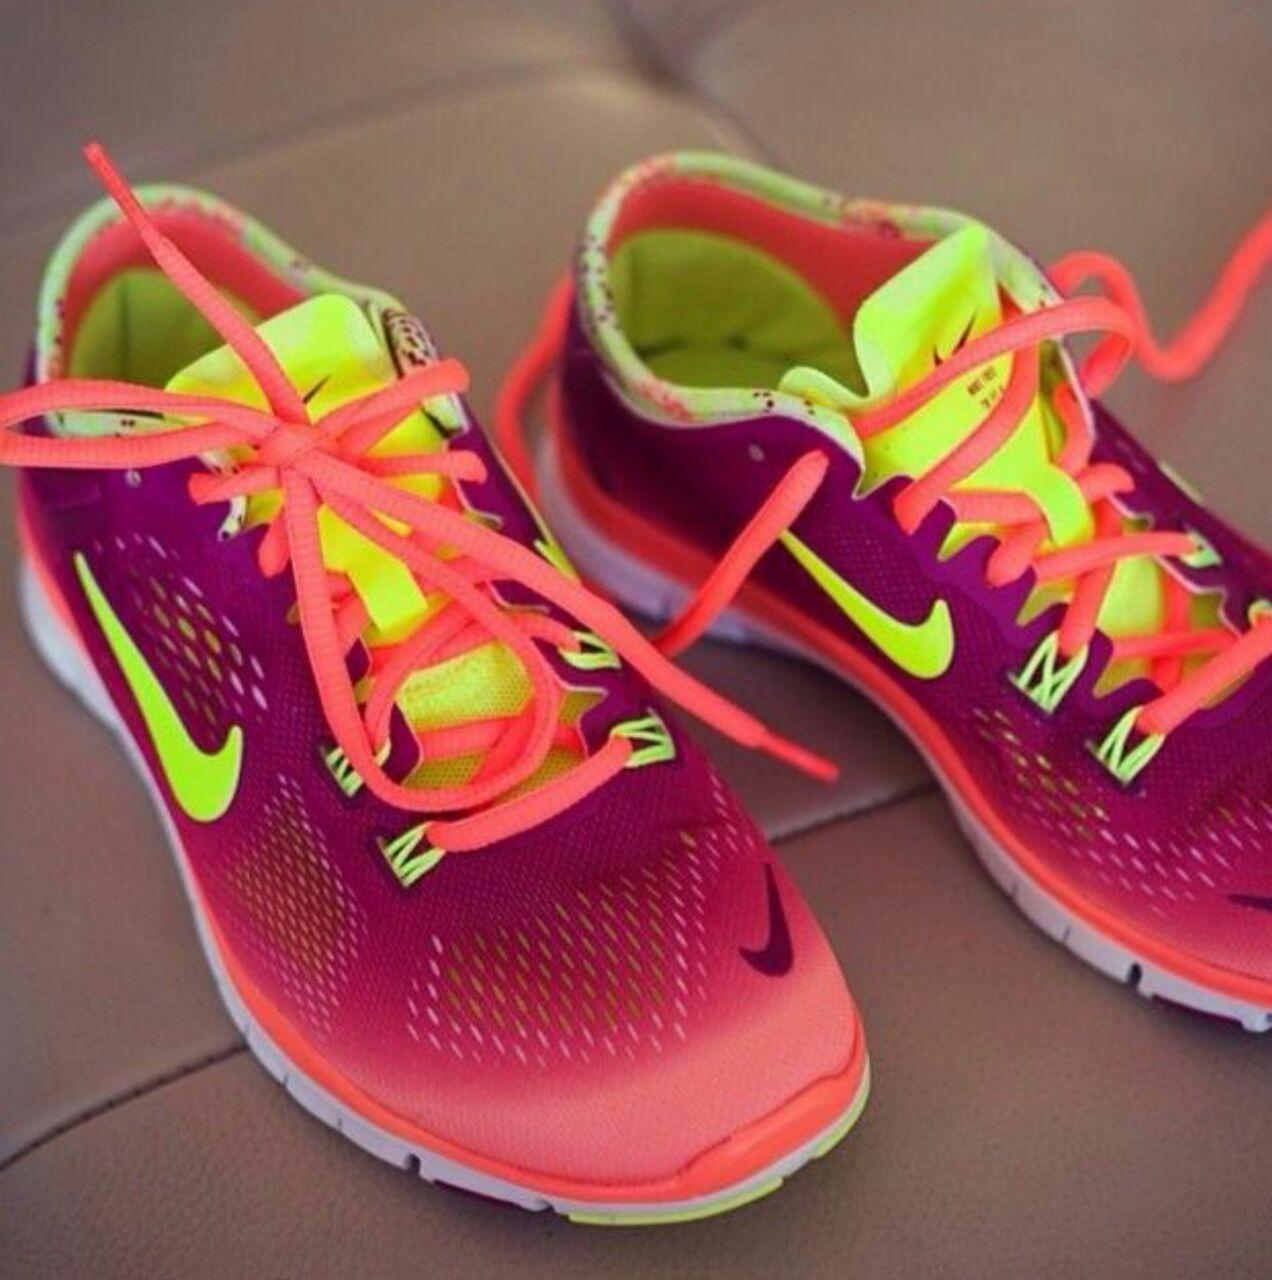 Nice Shoes 💙💚💛 💖💗💟💜 | Sneakers men fashion, Nike free